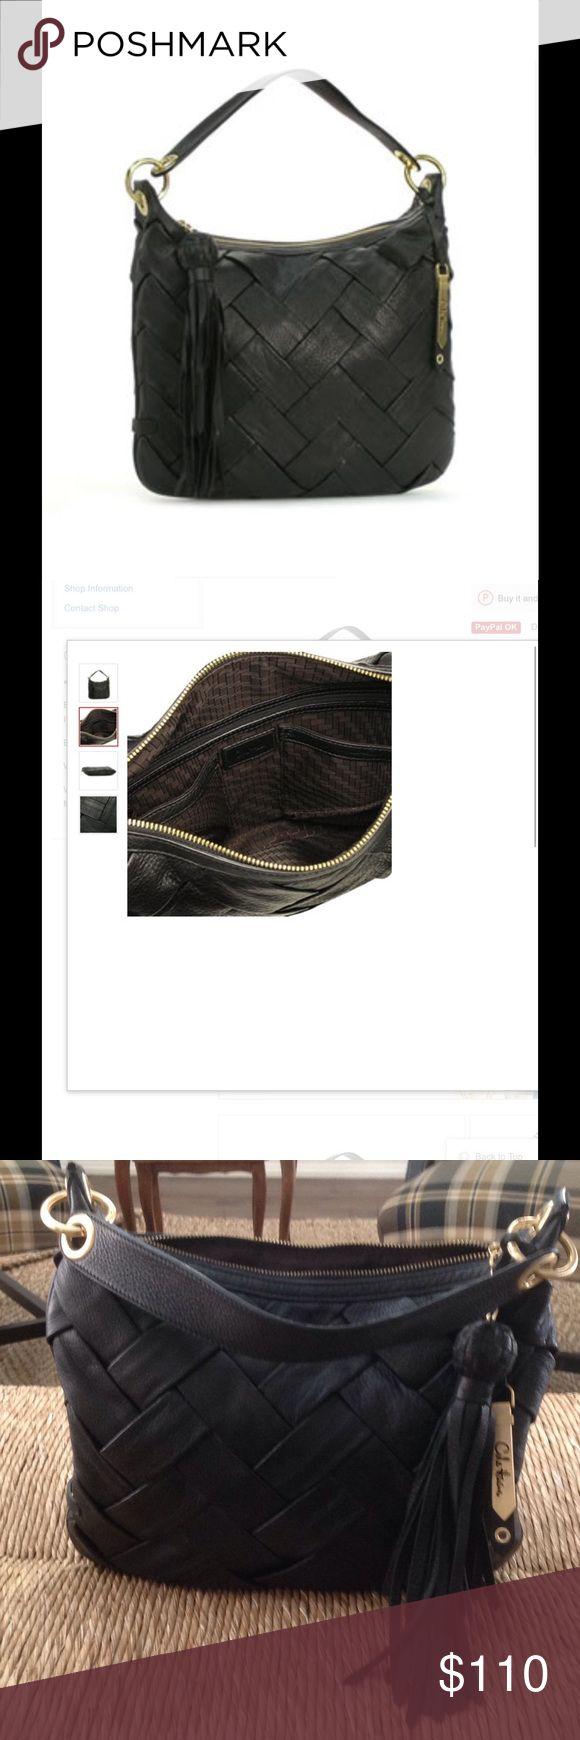 Cole Haan shoulder bag/B26902 small Hobo prudence Black leather hobo shoulder bag like brand new. Cole Haan Bags Hobos